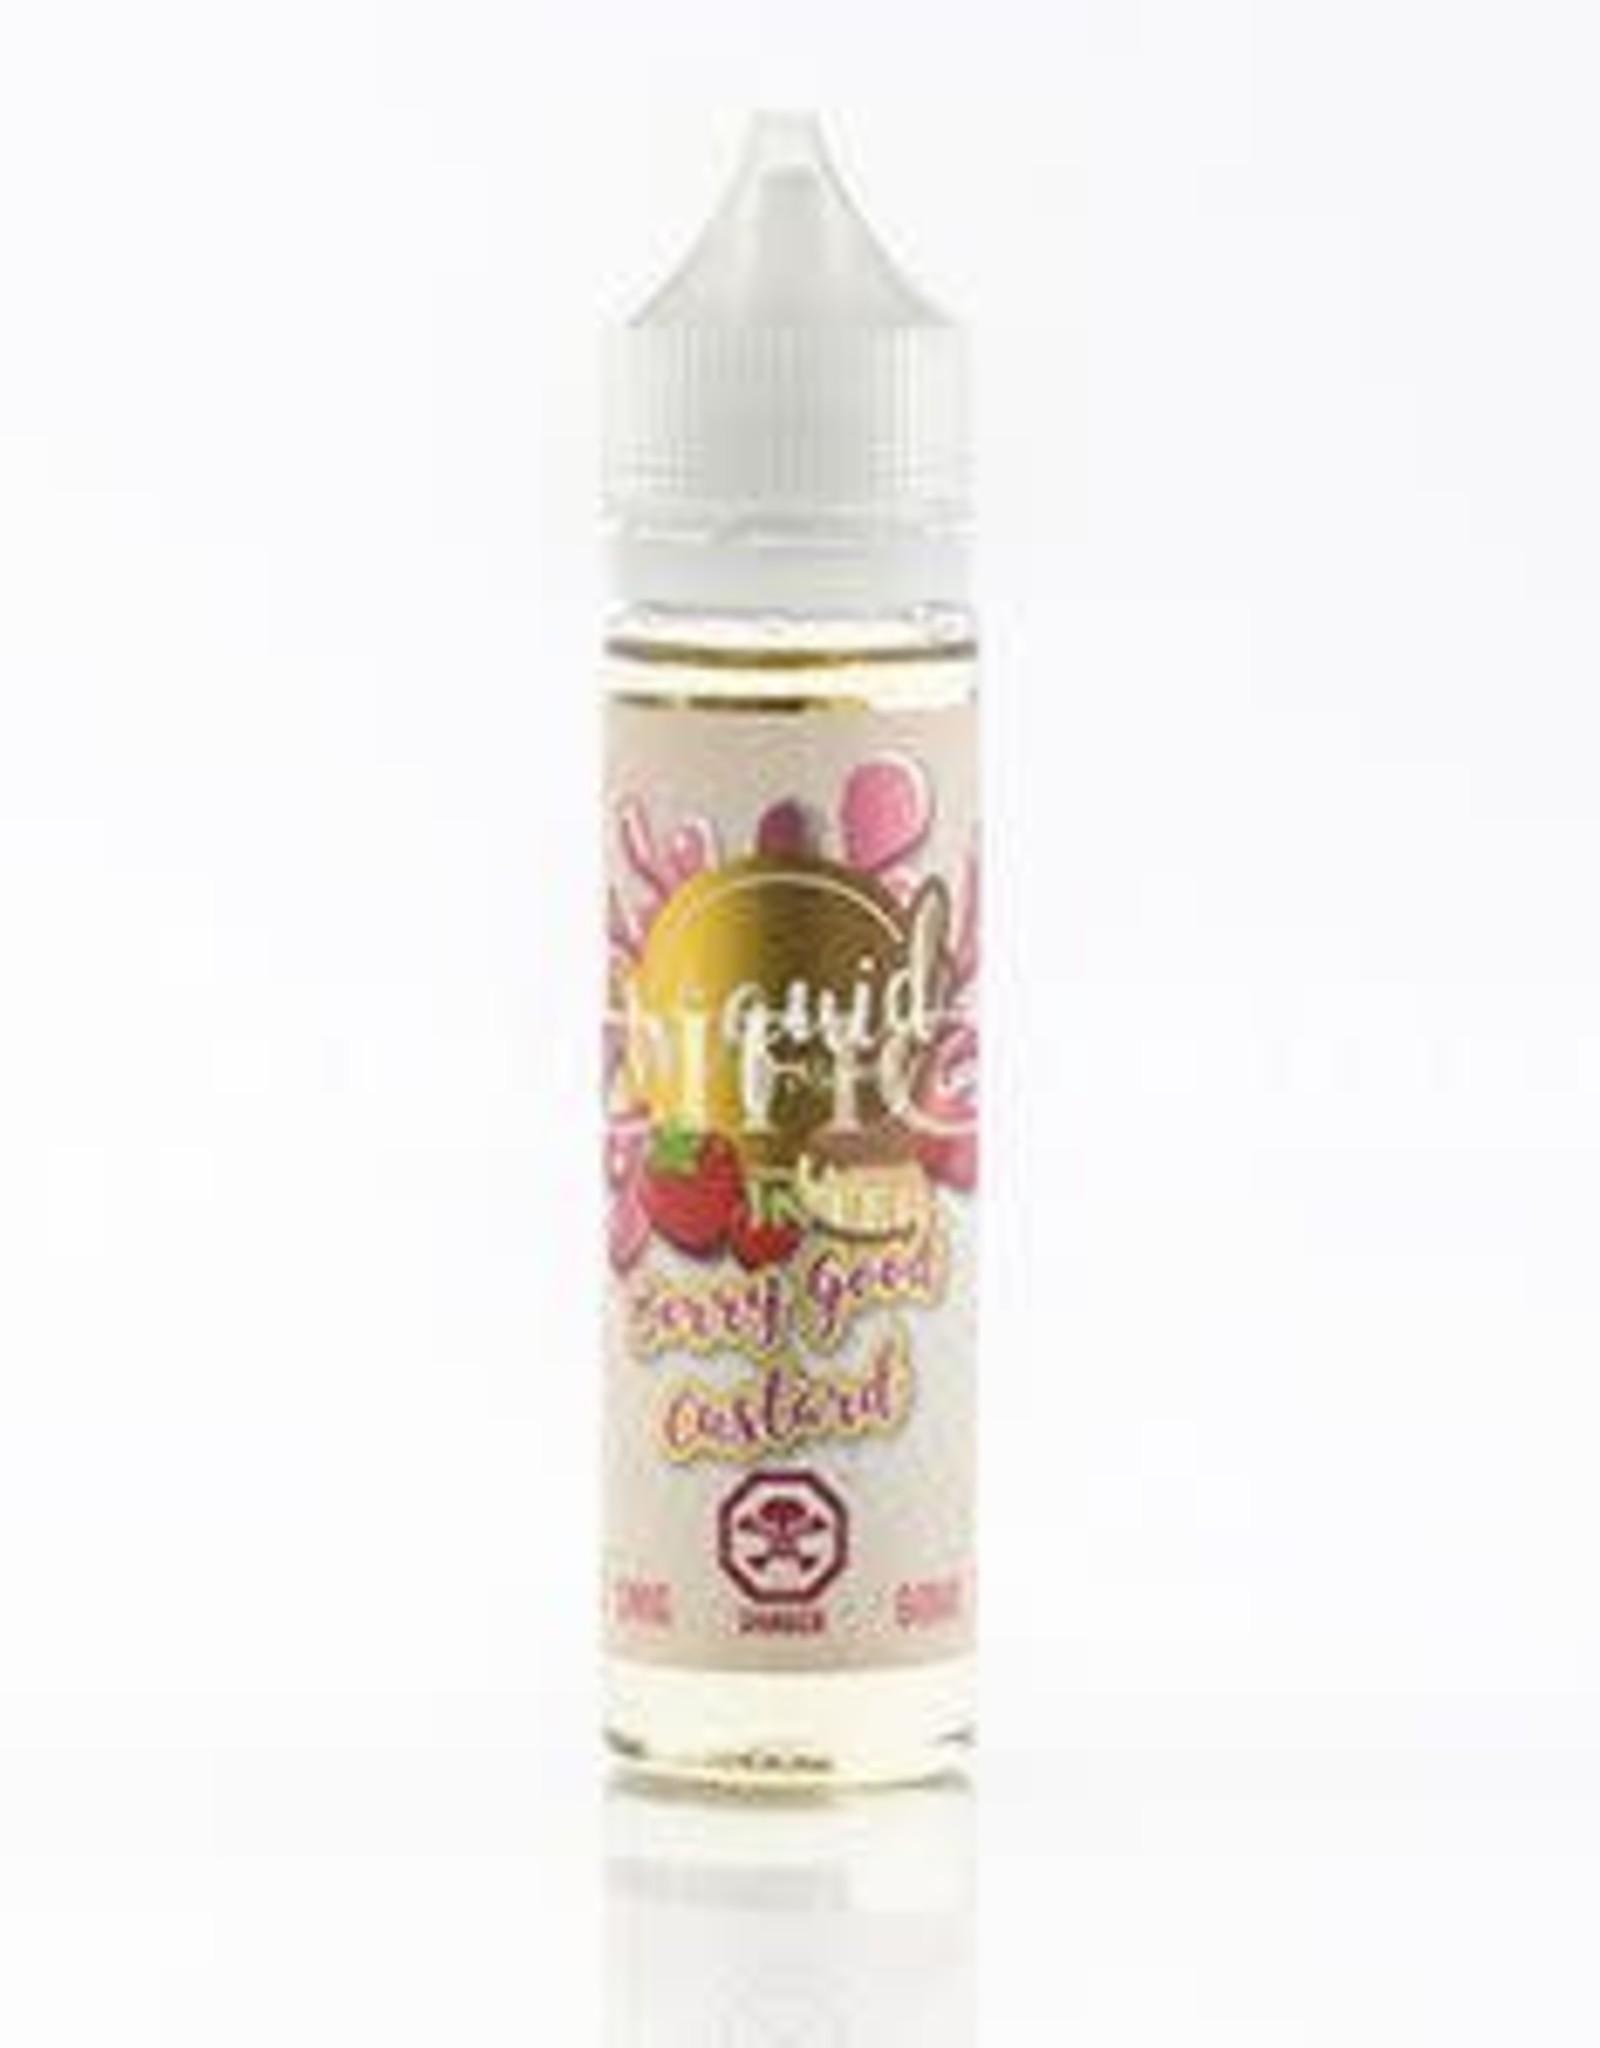 Wiquid: Berry Good Custard (60mL)